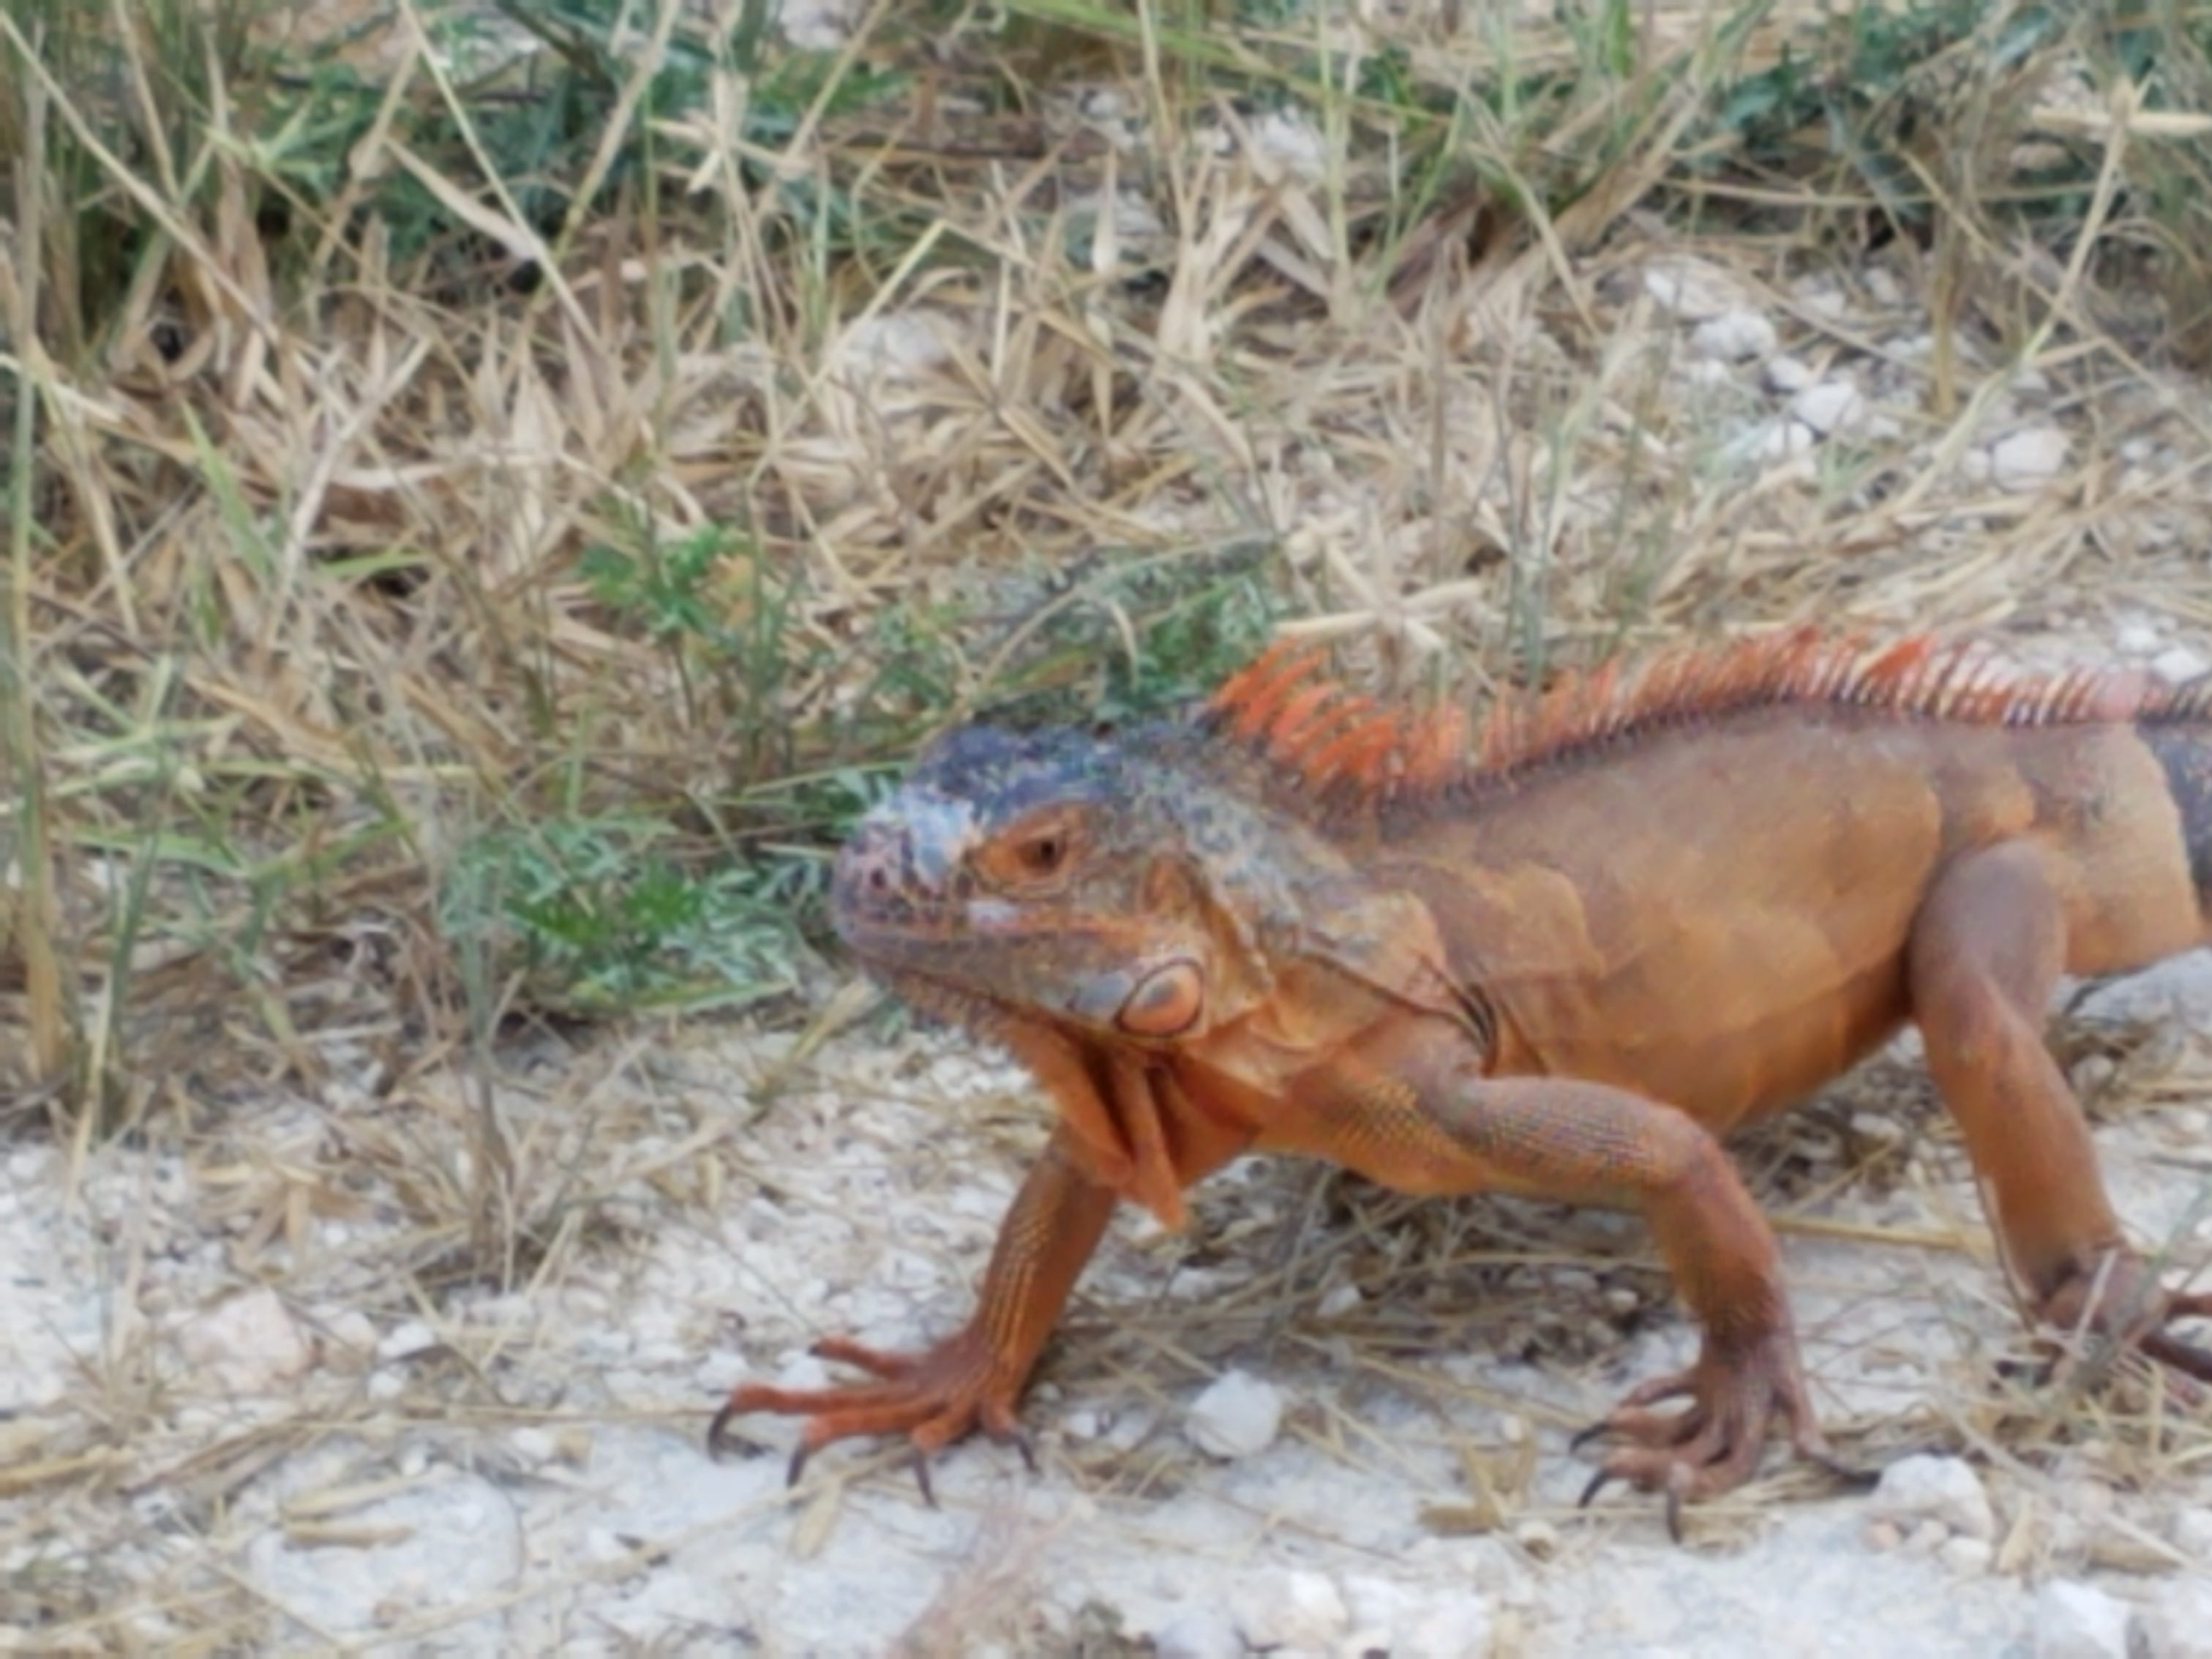 An orange iguana has been spotted at Merritt Island National Wildlife Refuge.